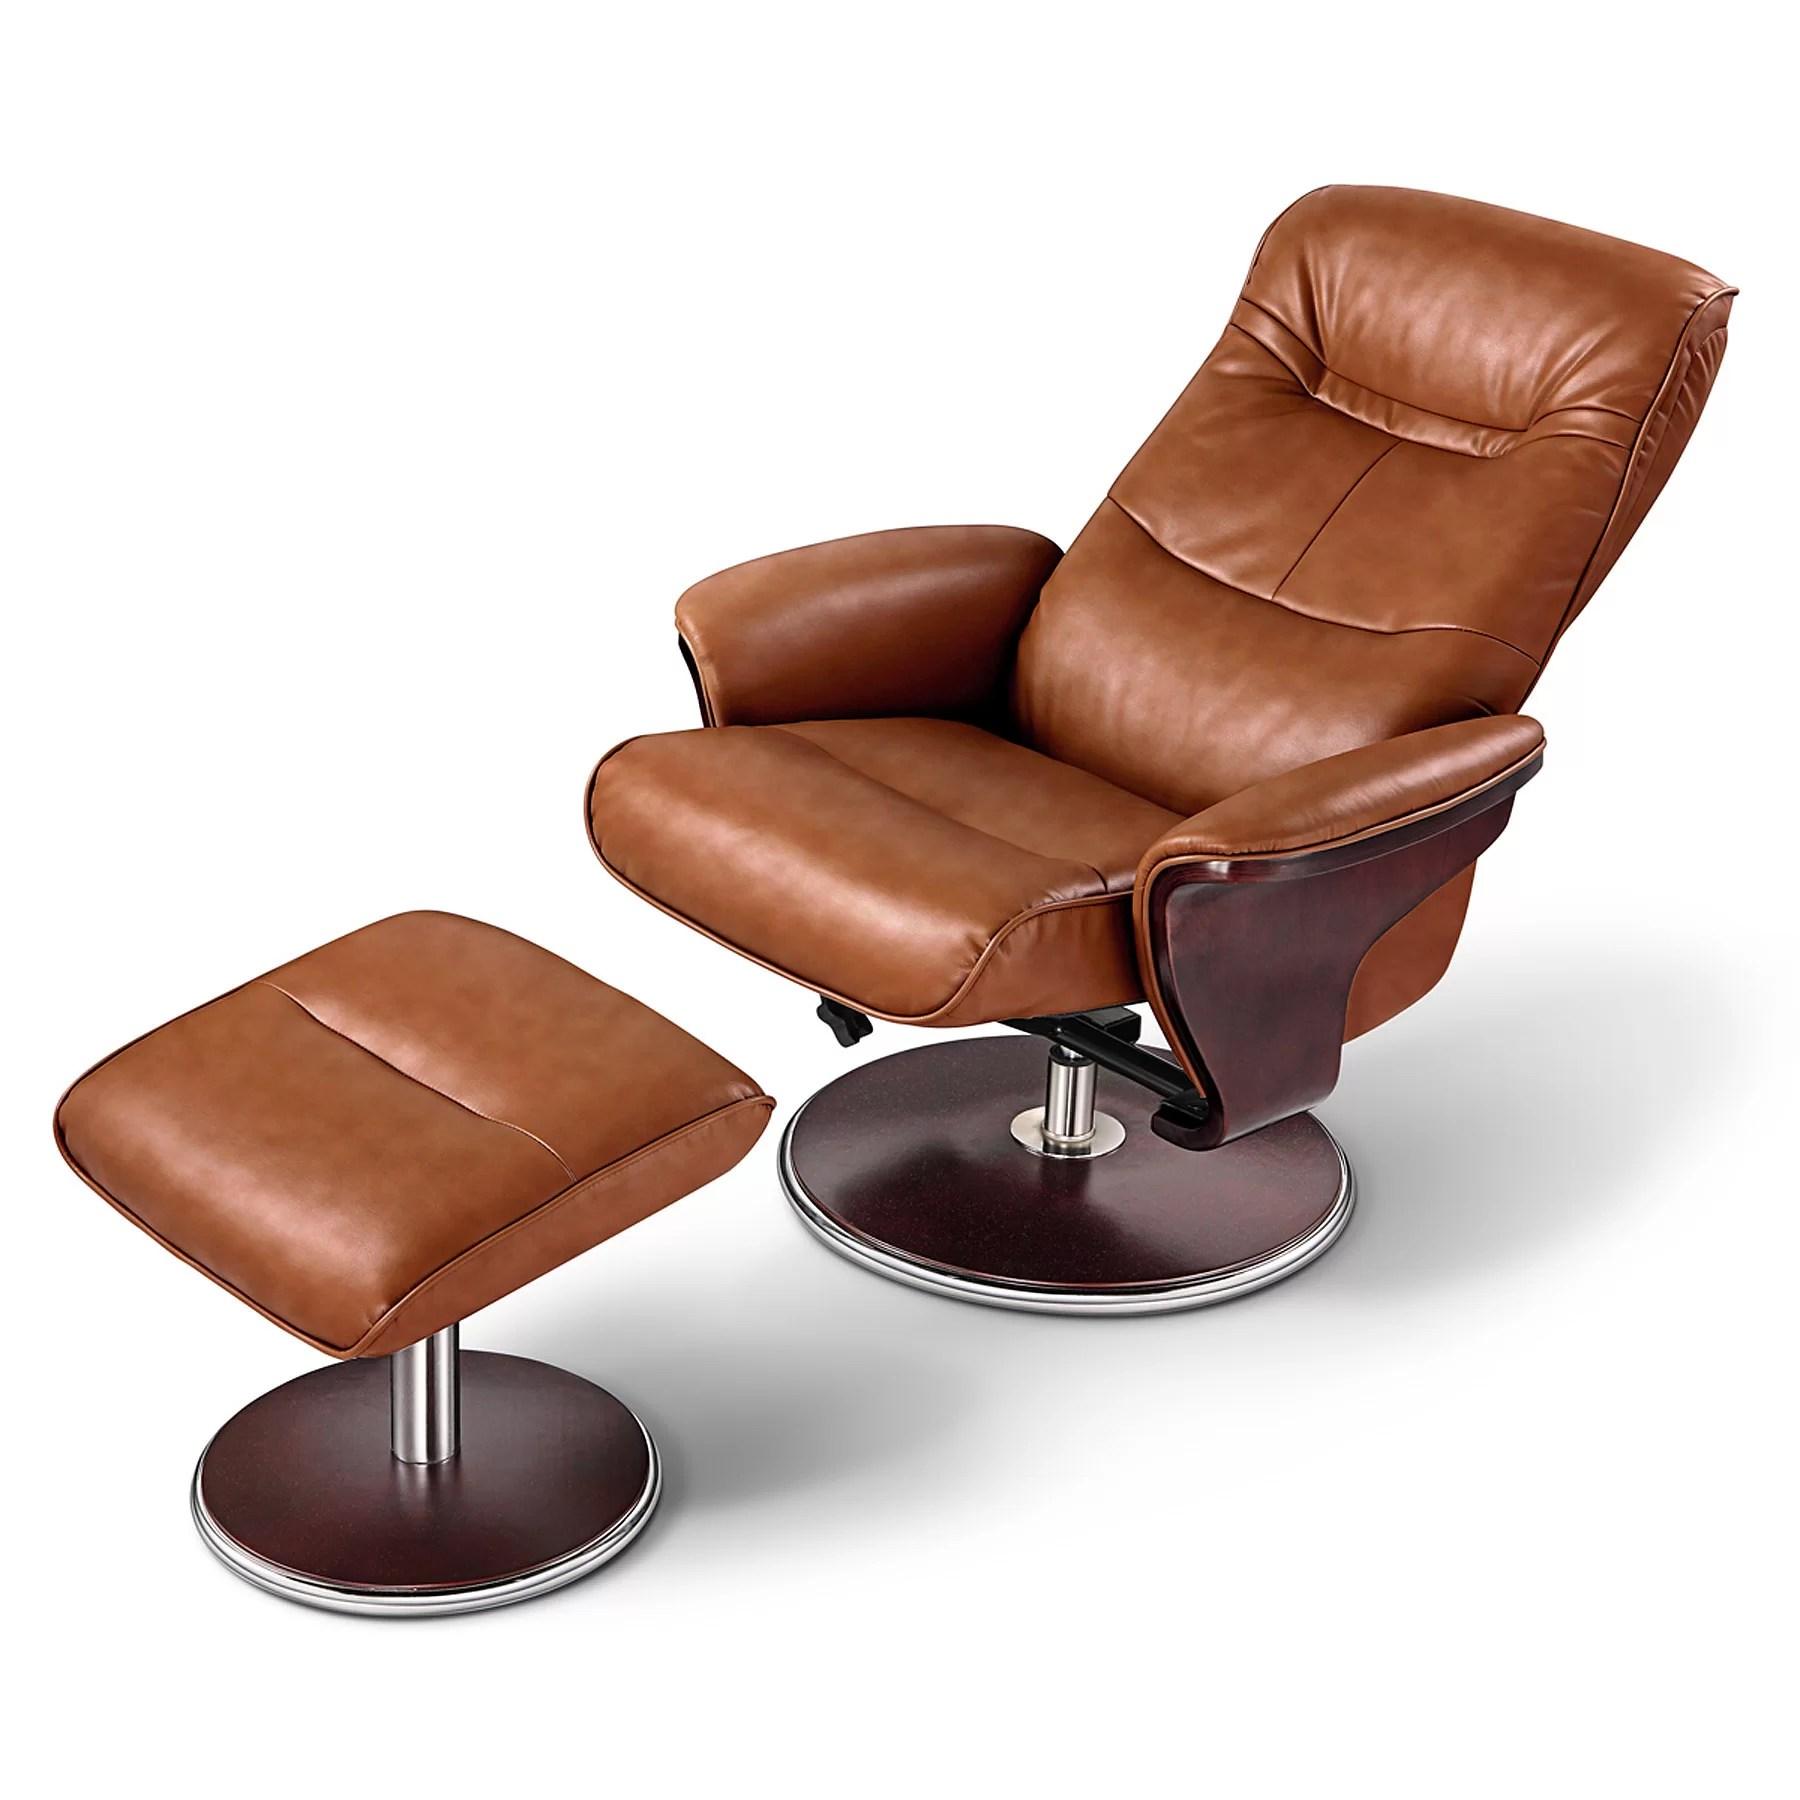 Artiva USA Milano Leather Swivel Recliner and Ottoman  eBay